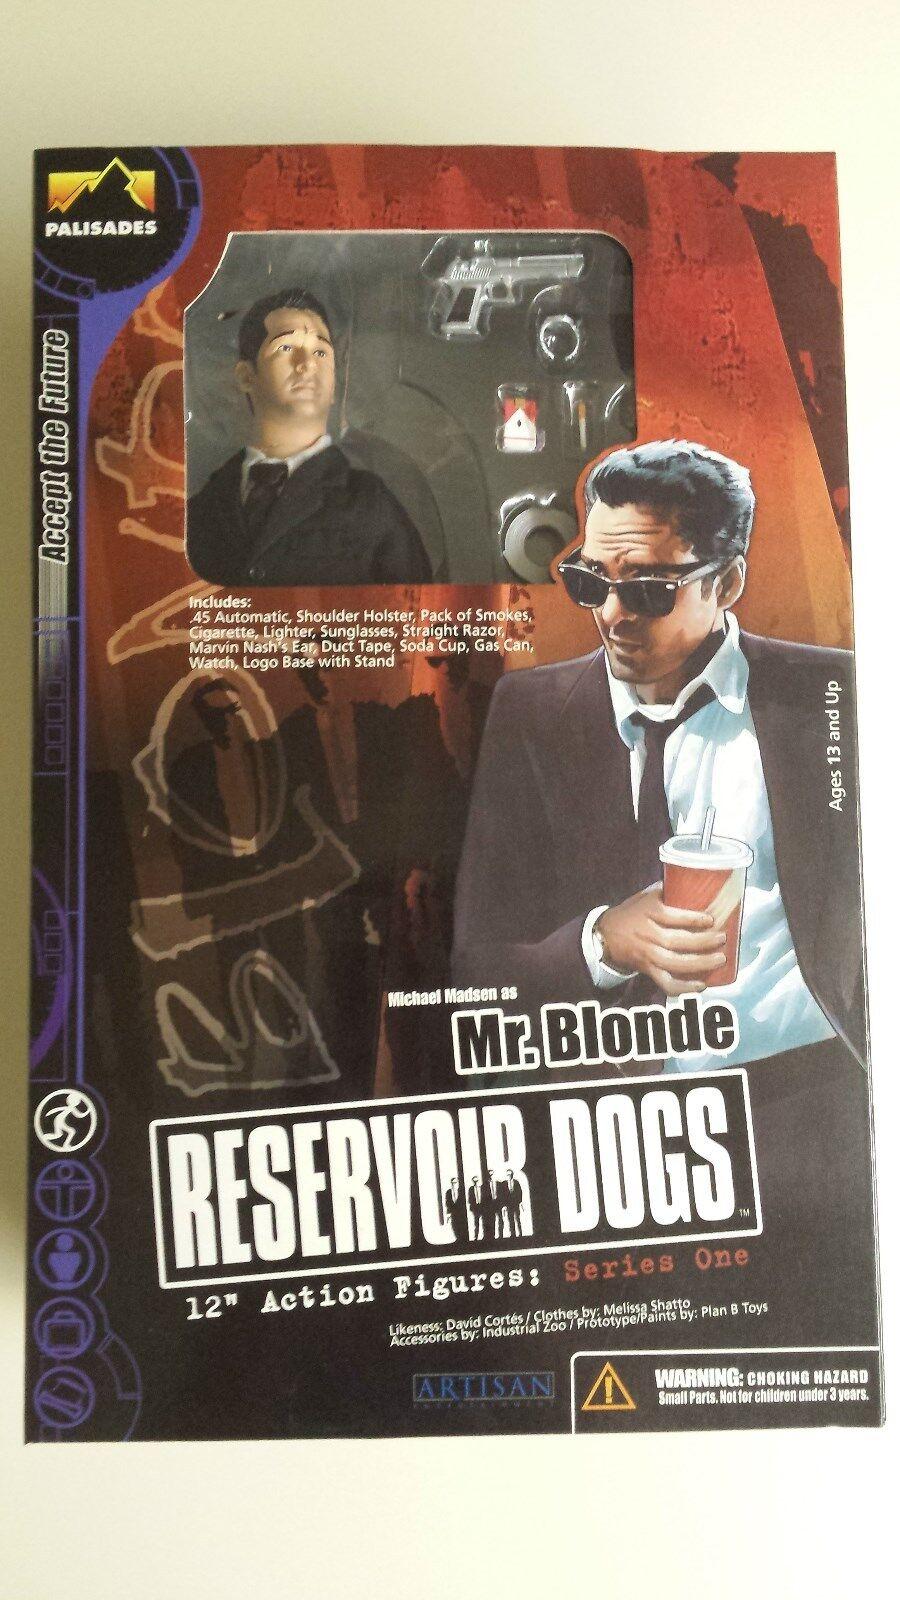 Reservoir dogs palisades original 12  action - figur mr. blonde reihe 1 nib